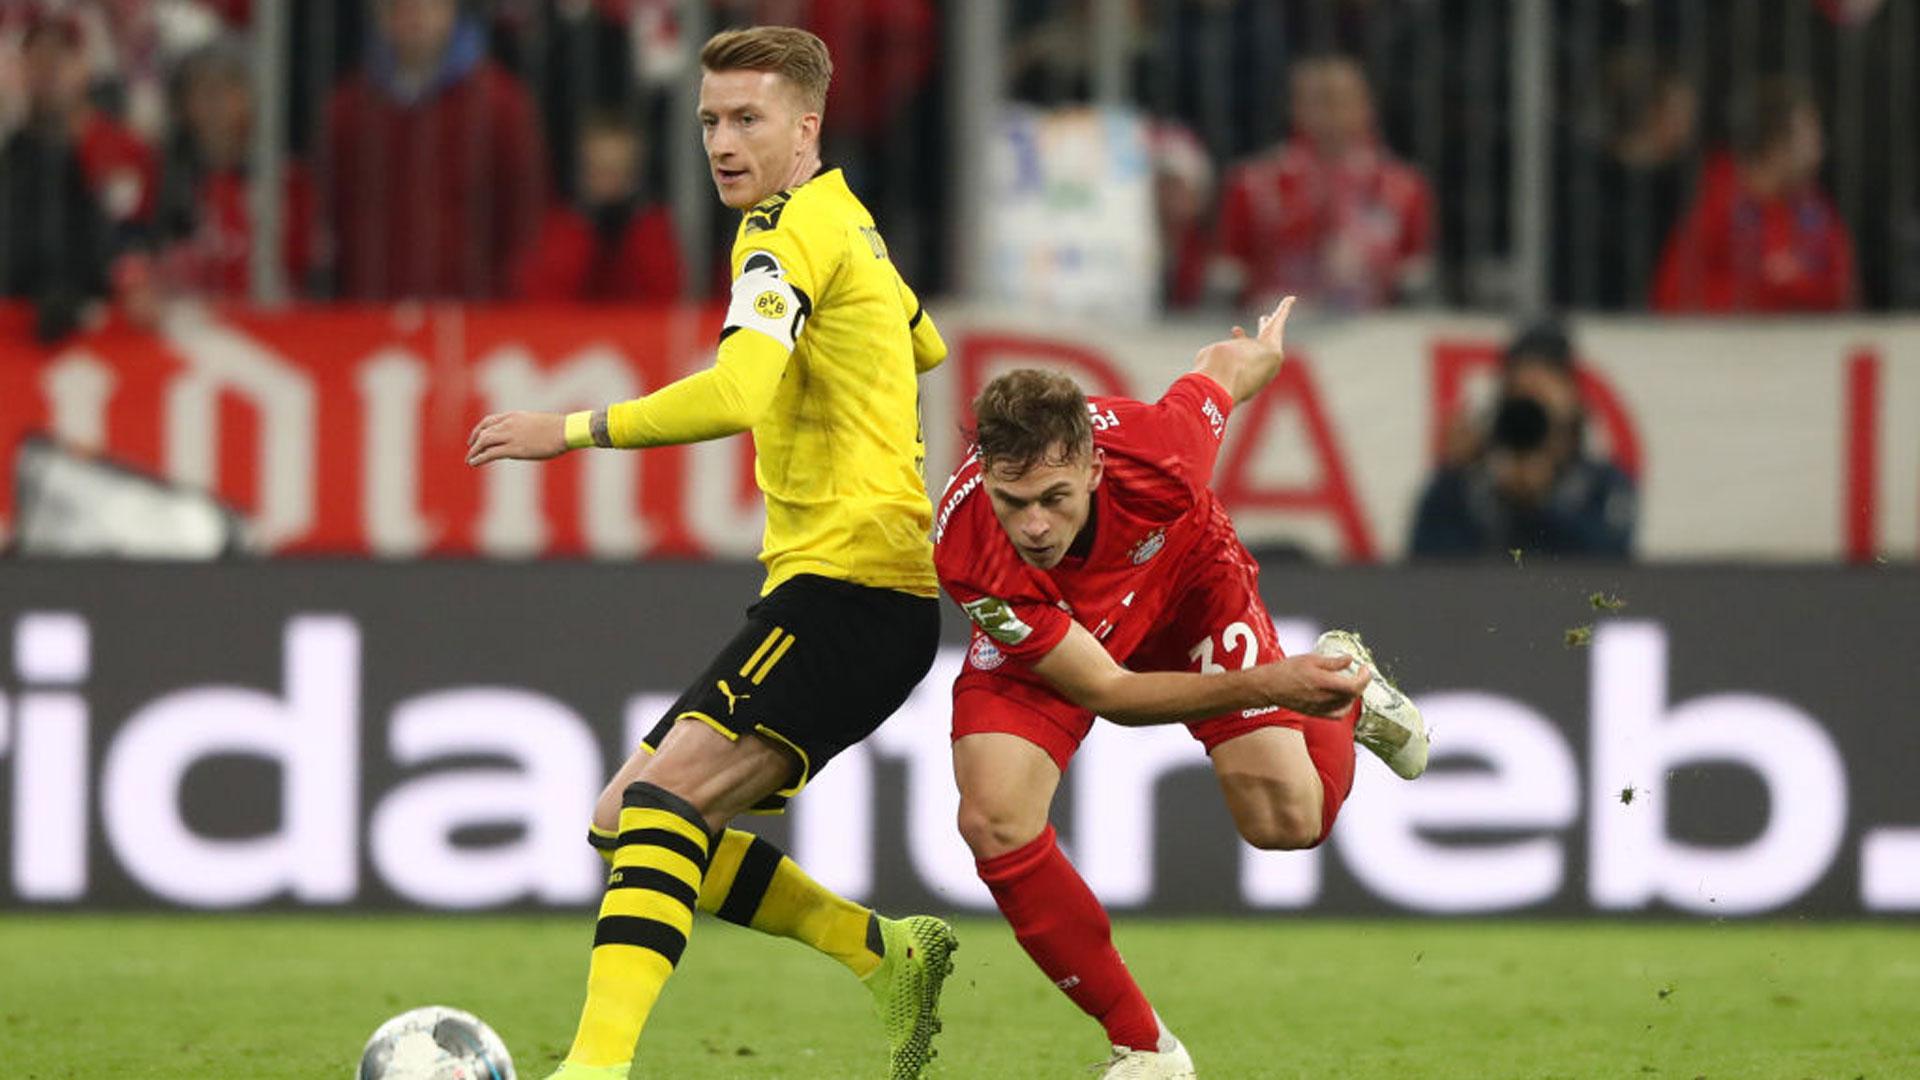 VIDÉO - 5 choses à savoir avant le choc Dortmund - Bayern